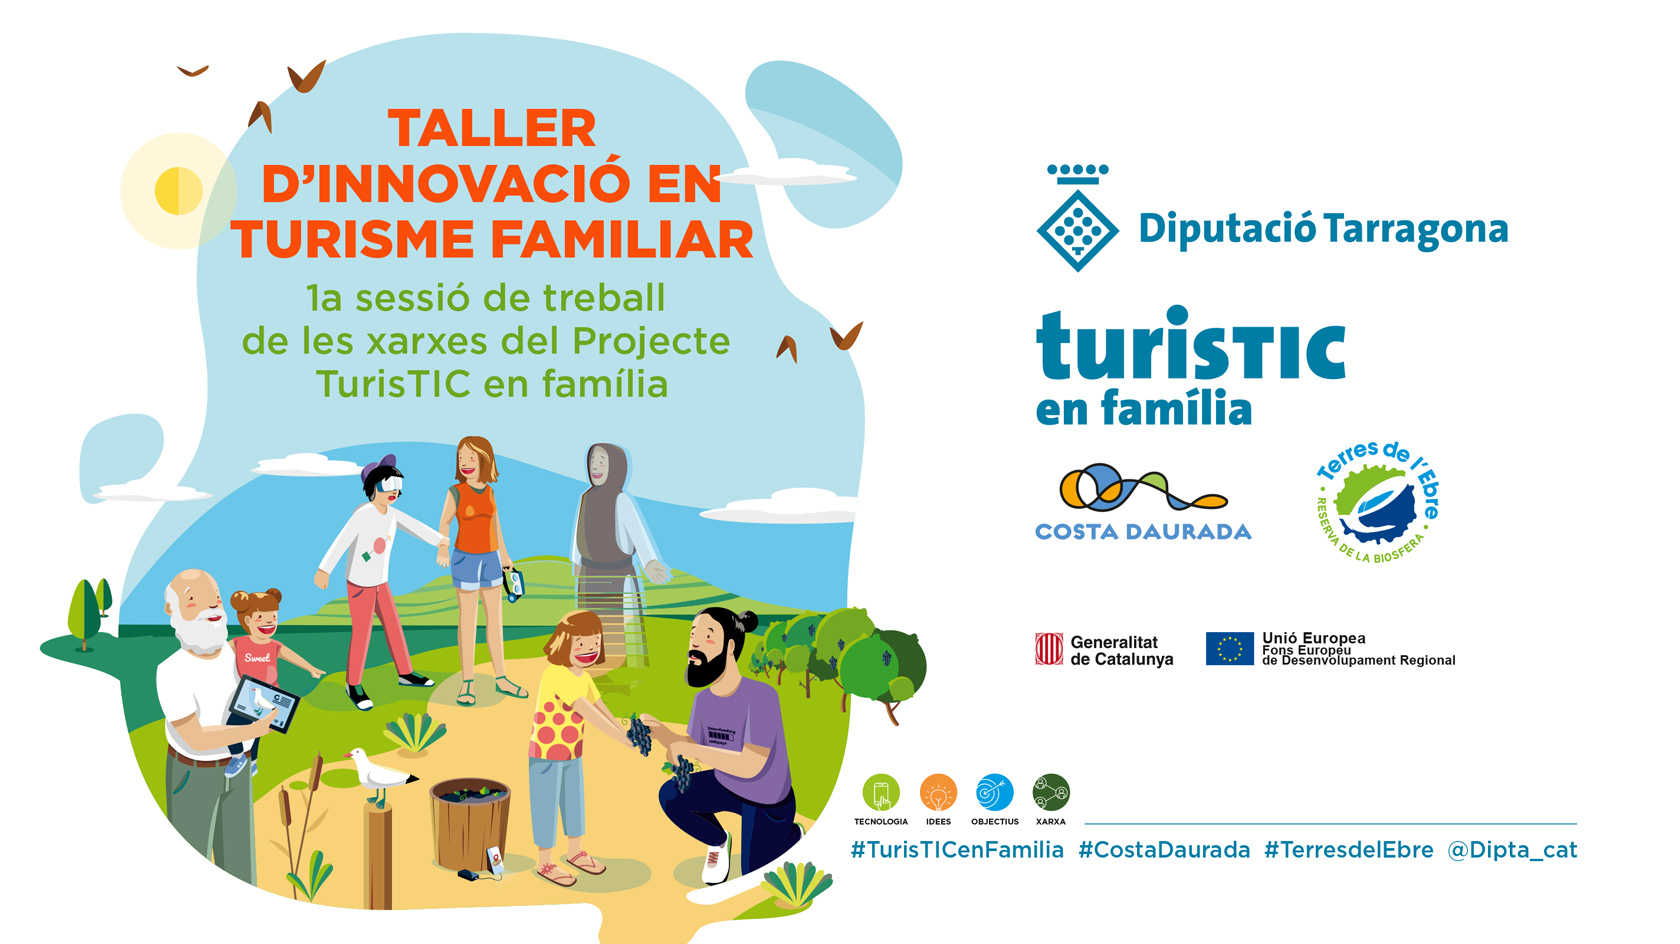 Taller innovació turisme familiar